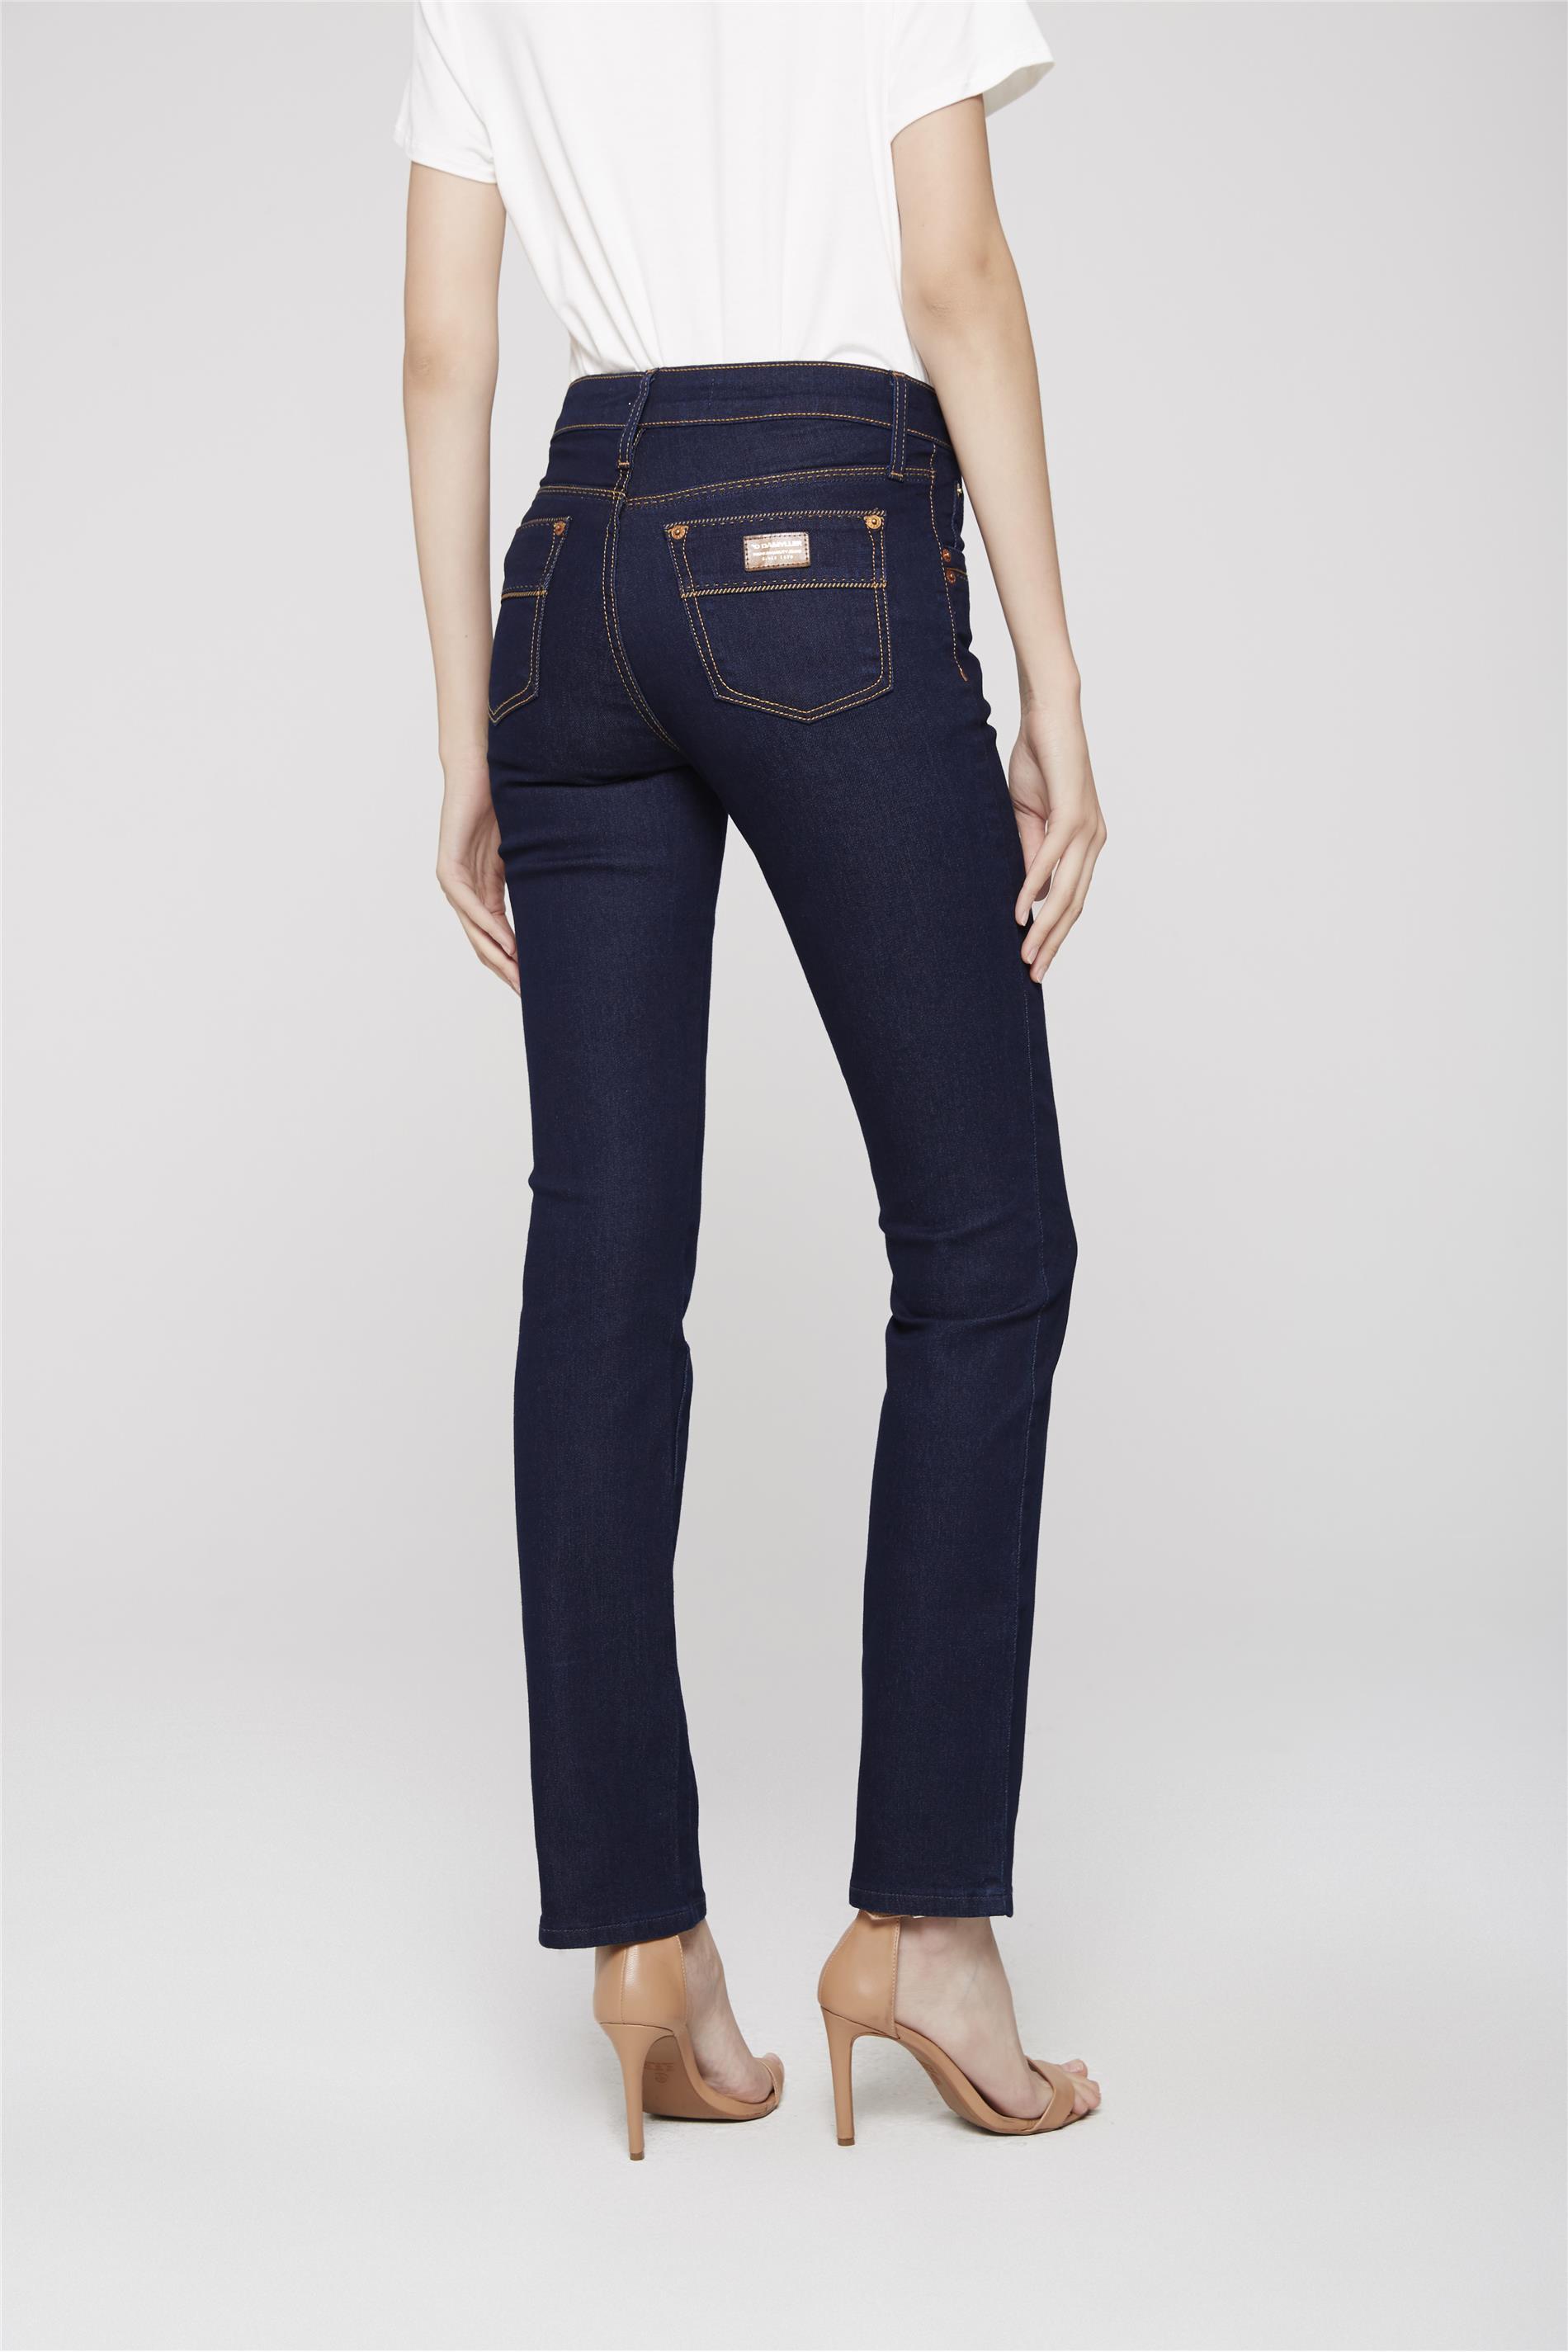 2bb2a720d Calça Jeans Reta de Cintura Alta - Damyller